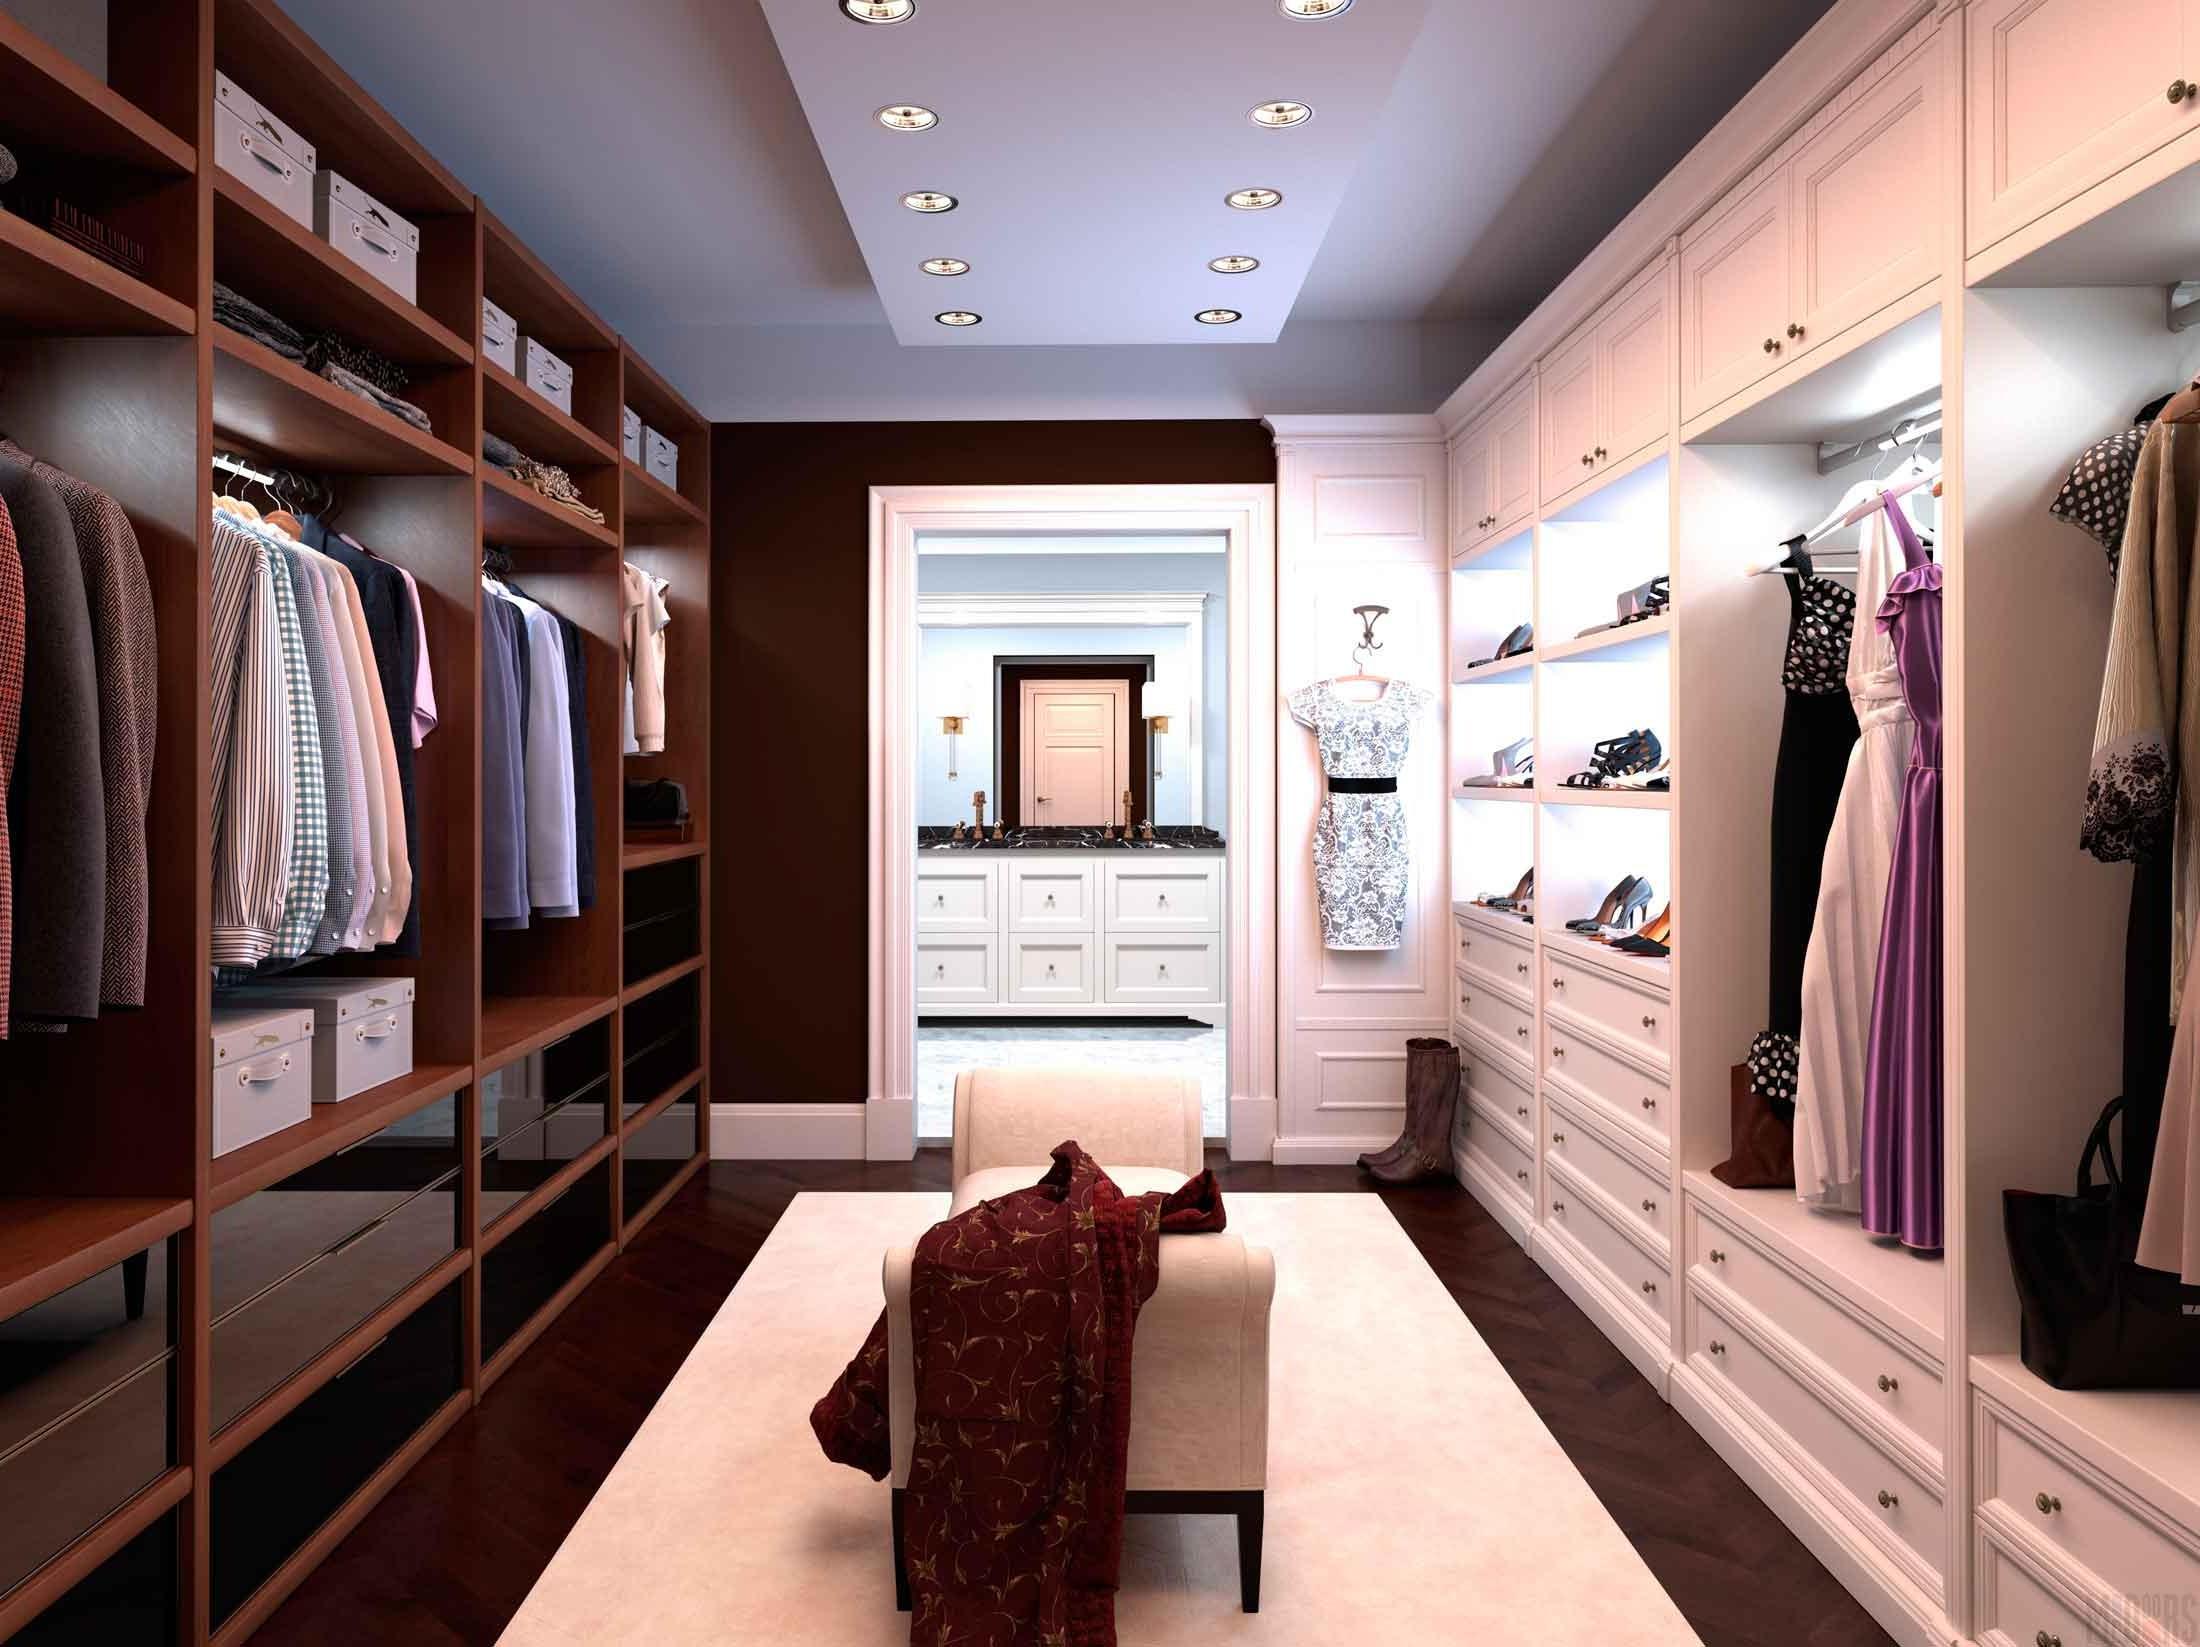 Dressing room design with transparent doors